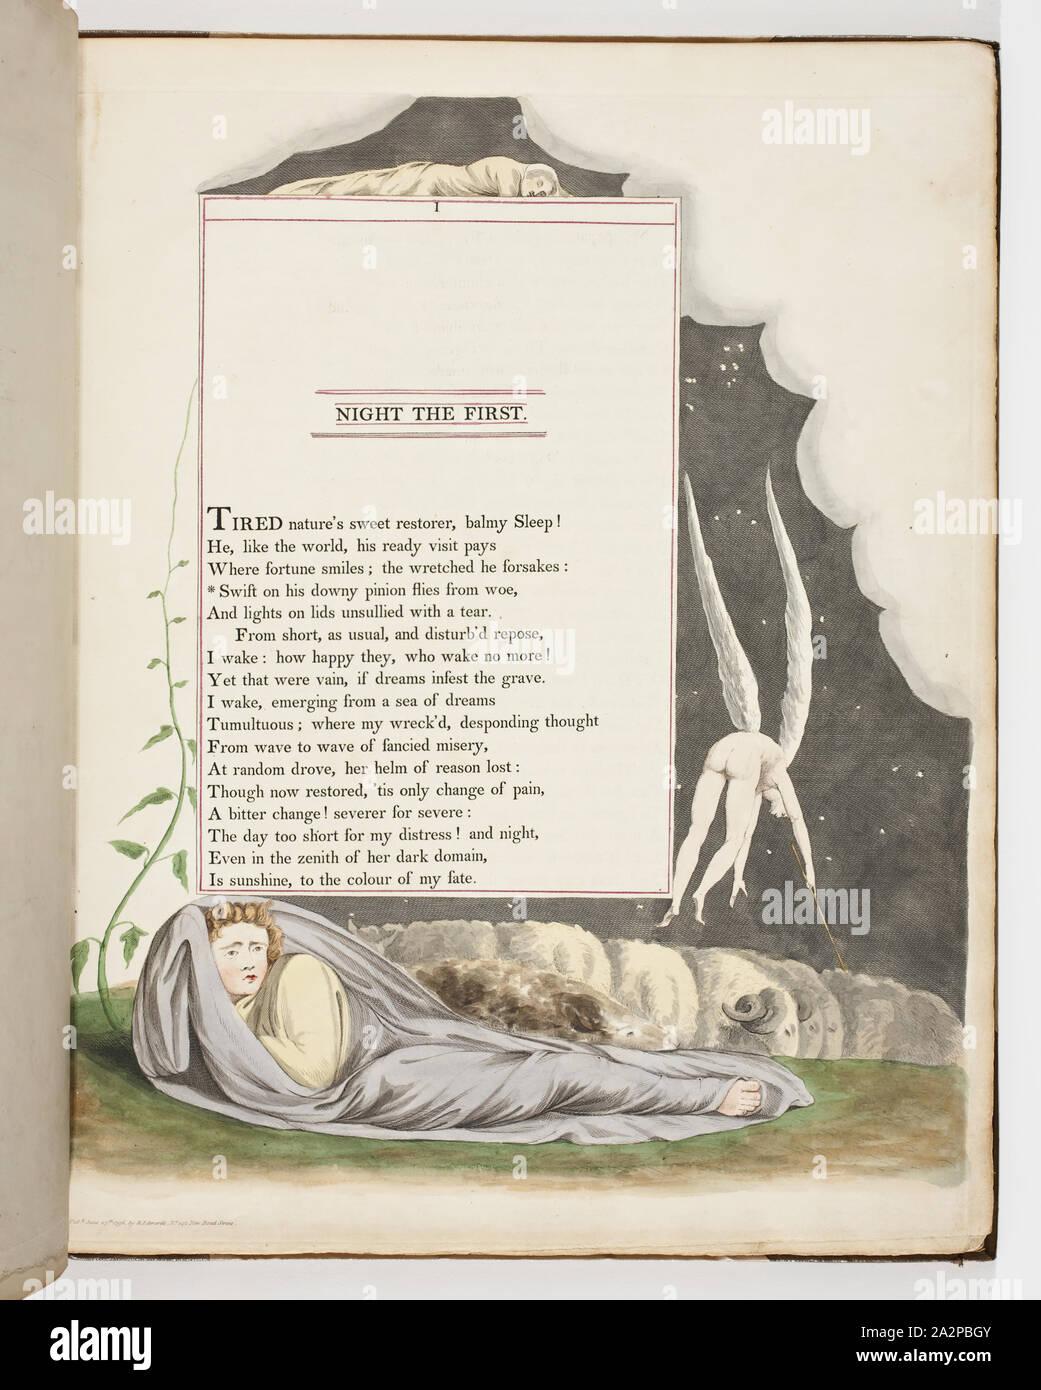 William Blake Chesterfield Sofa edward blake stock photos & edward blake stock images - alamy